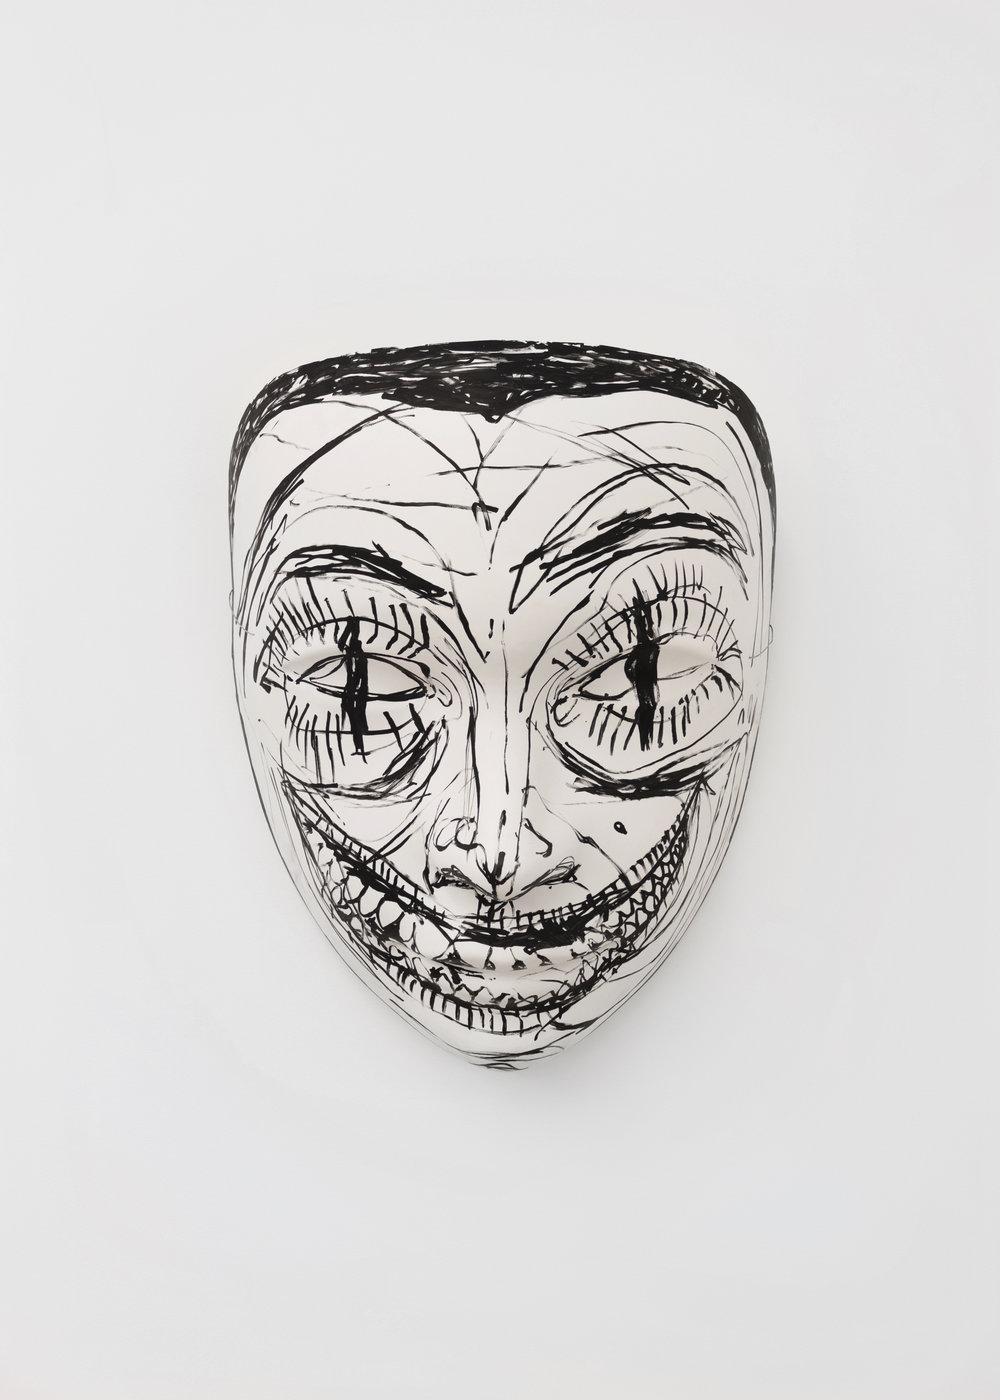 Chloe Siebert,  Mask 1 , 2018, acrylic, fiberglass, latex, and plaster, 42 x 34 x 18 in.